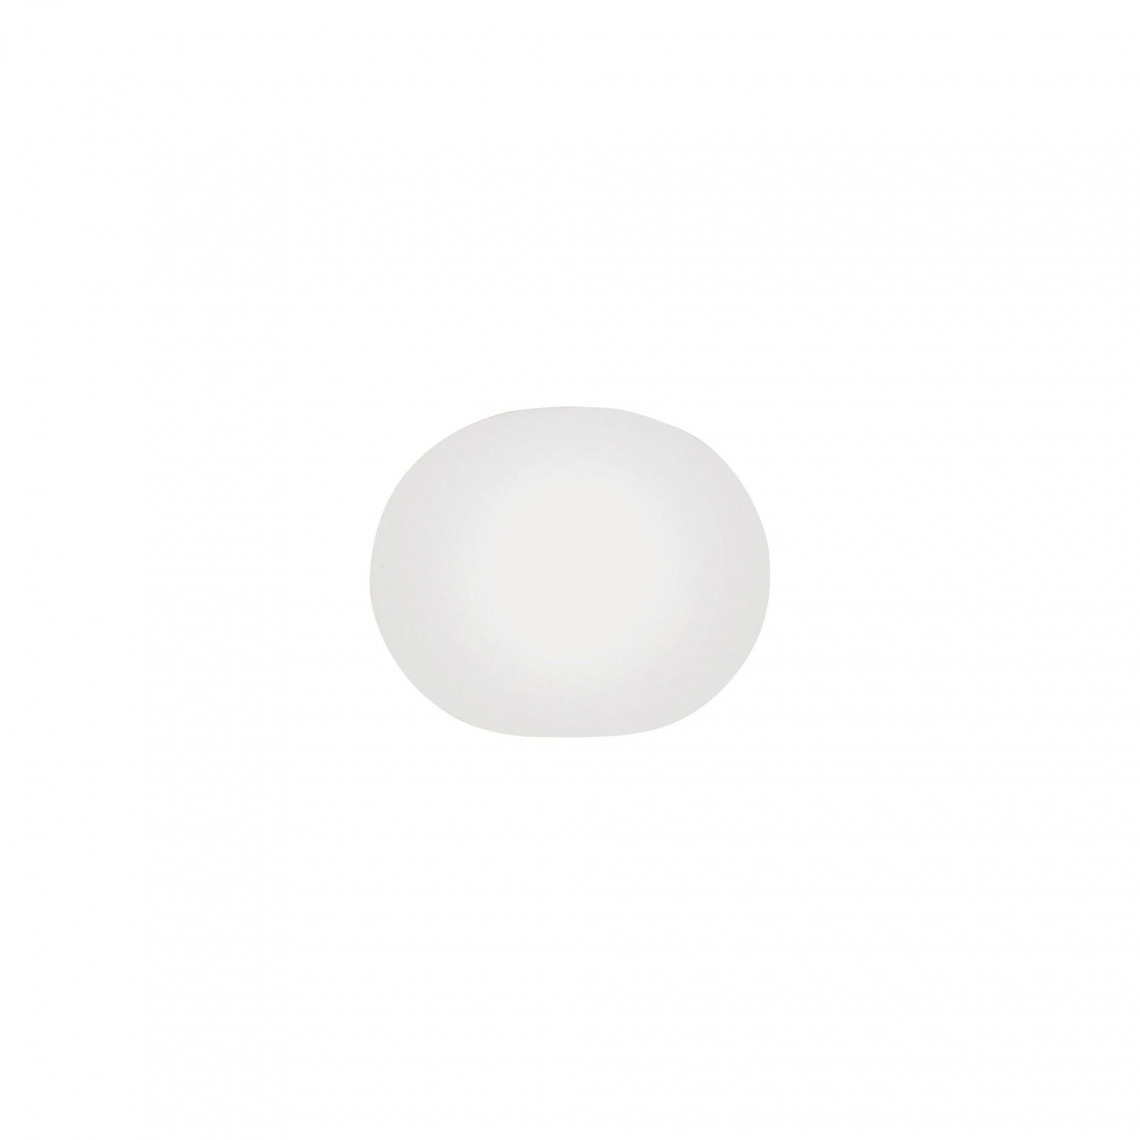 Glo-Ball Wall